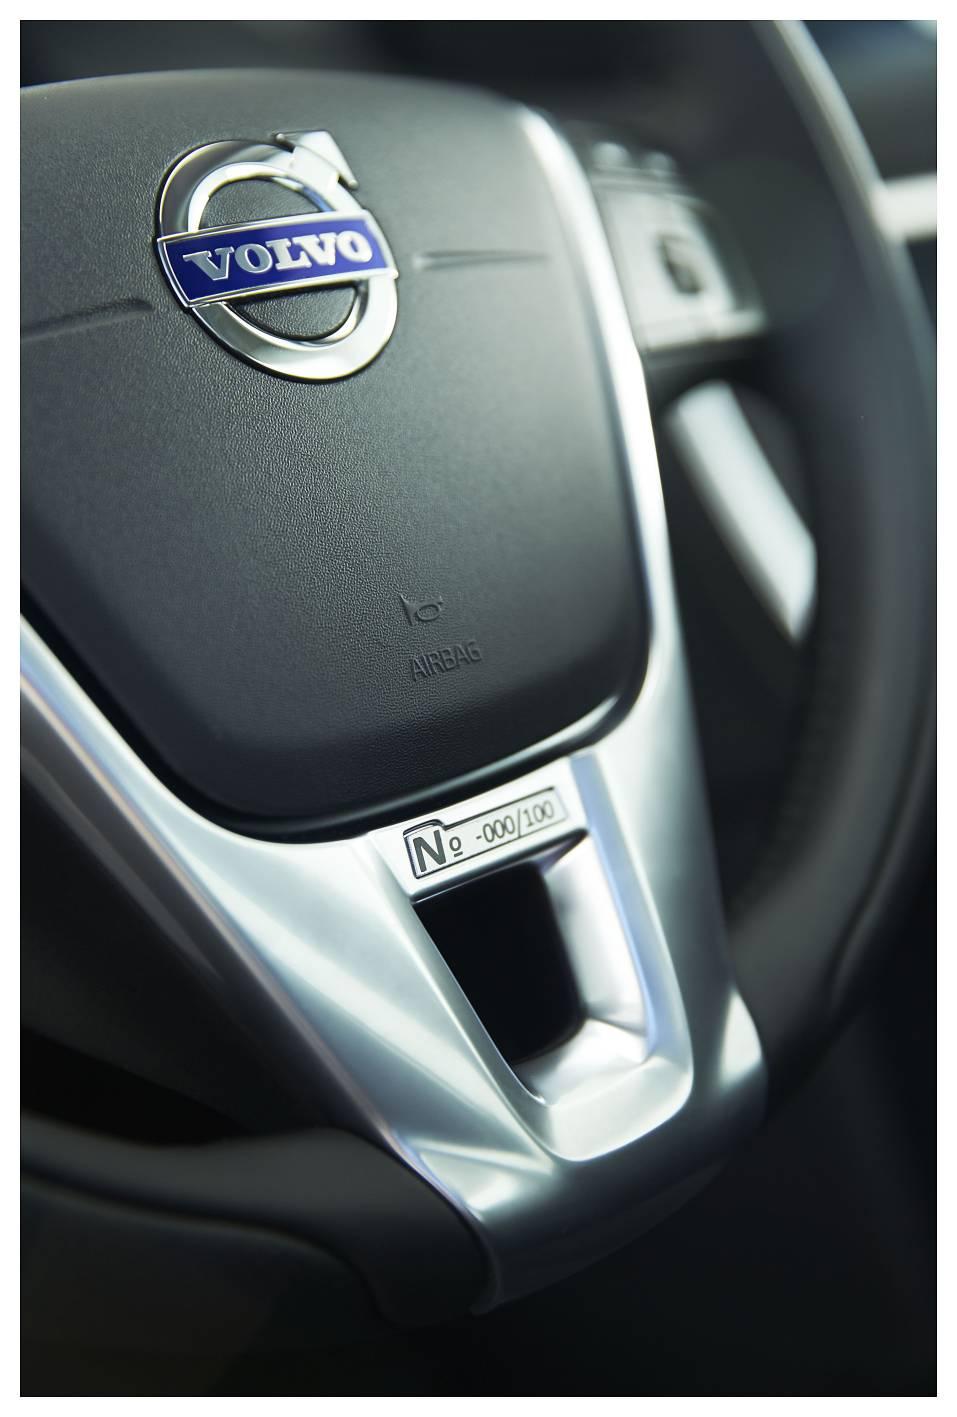 Australia First To Receive 257kw Volvo S60 Polestar